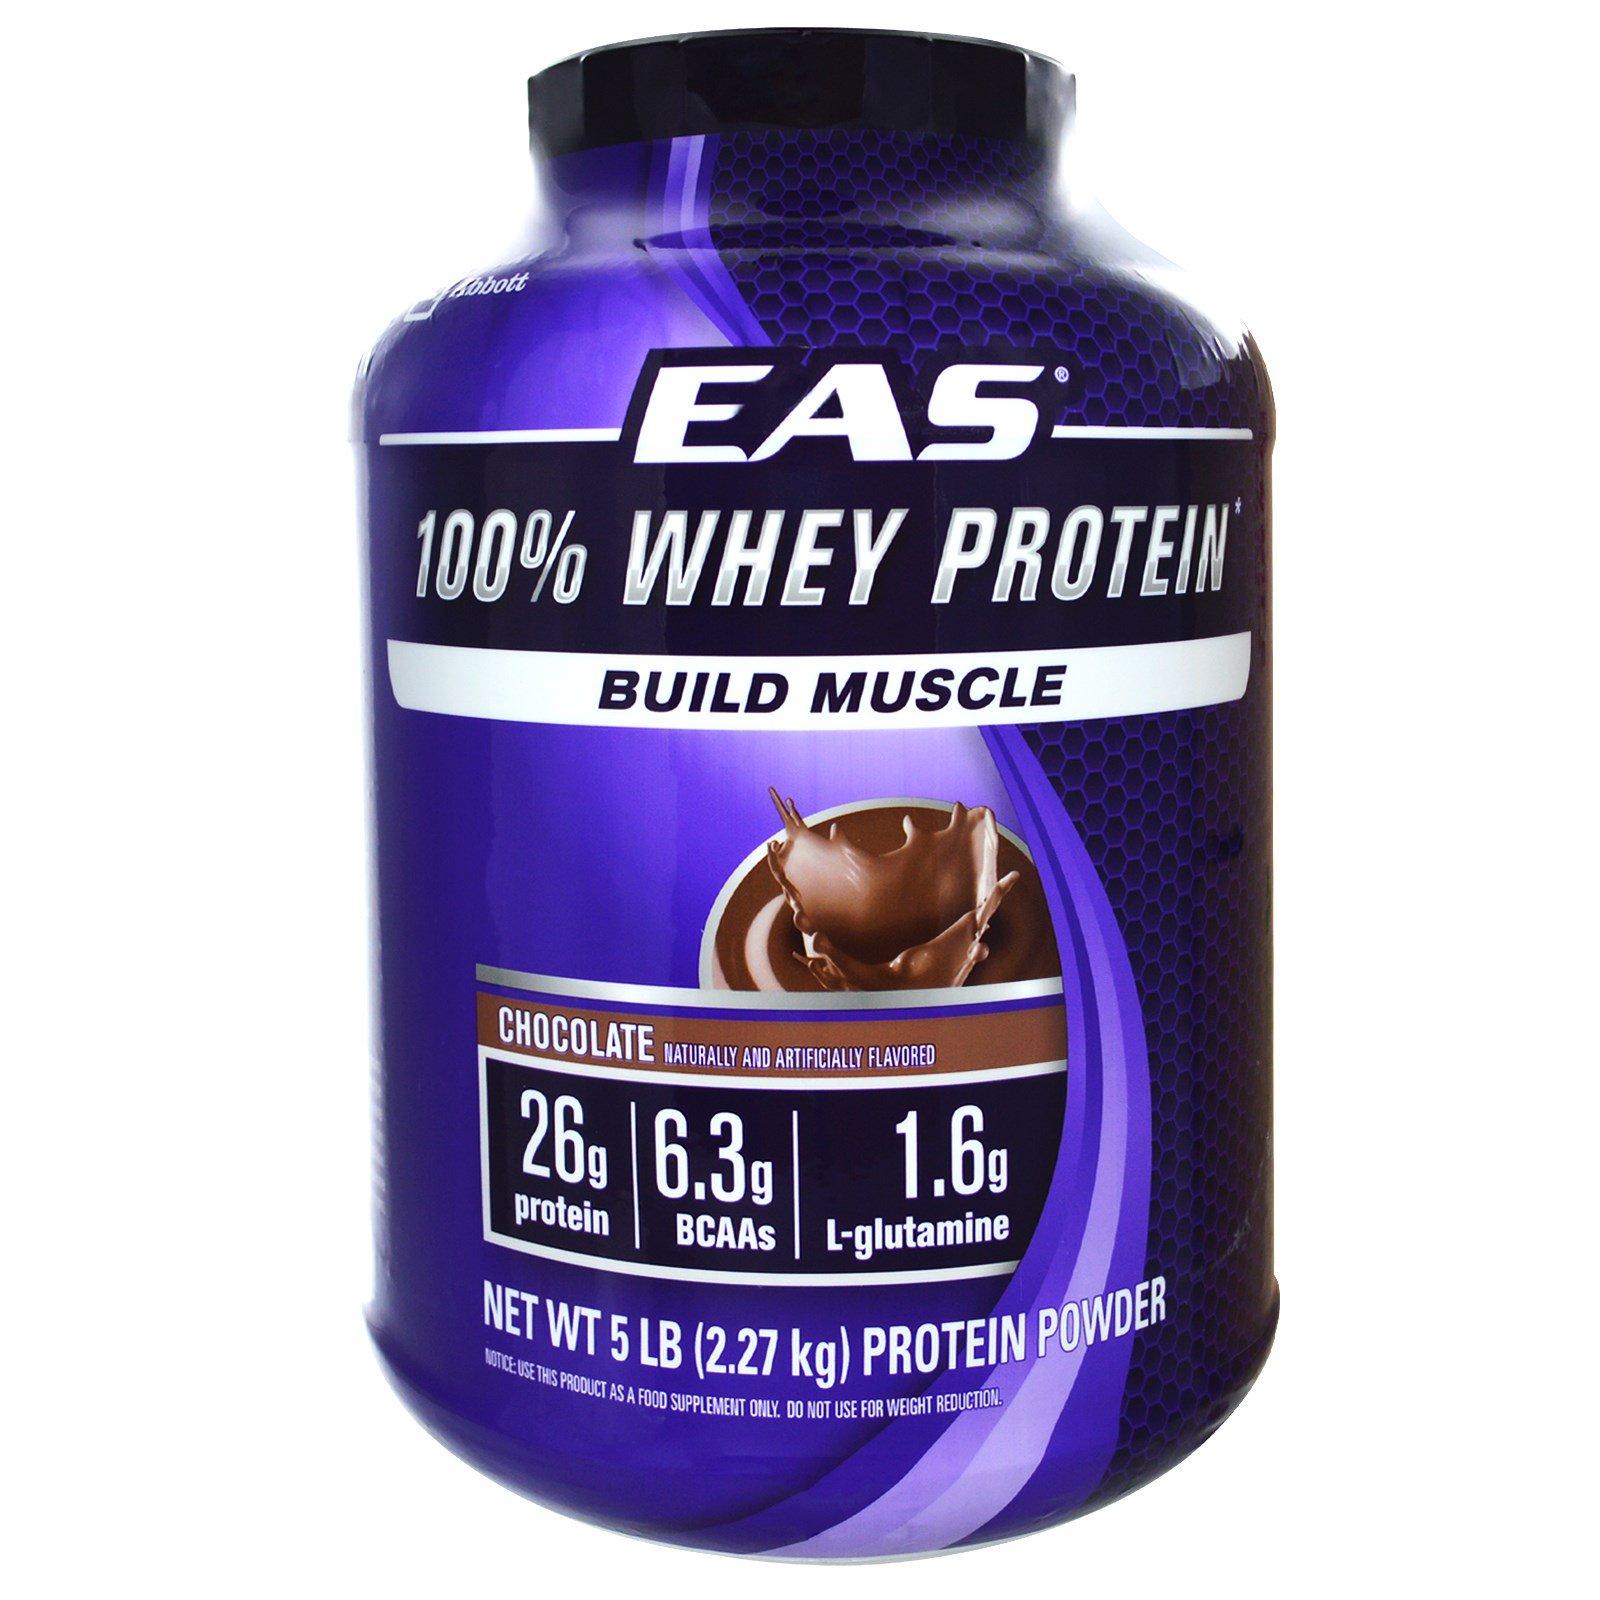 Whey protein poweder